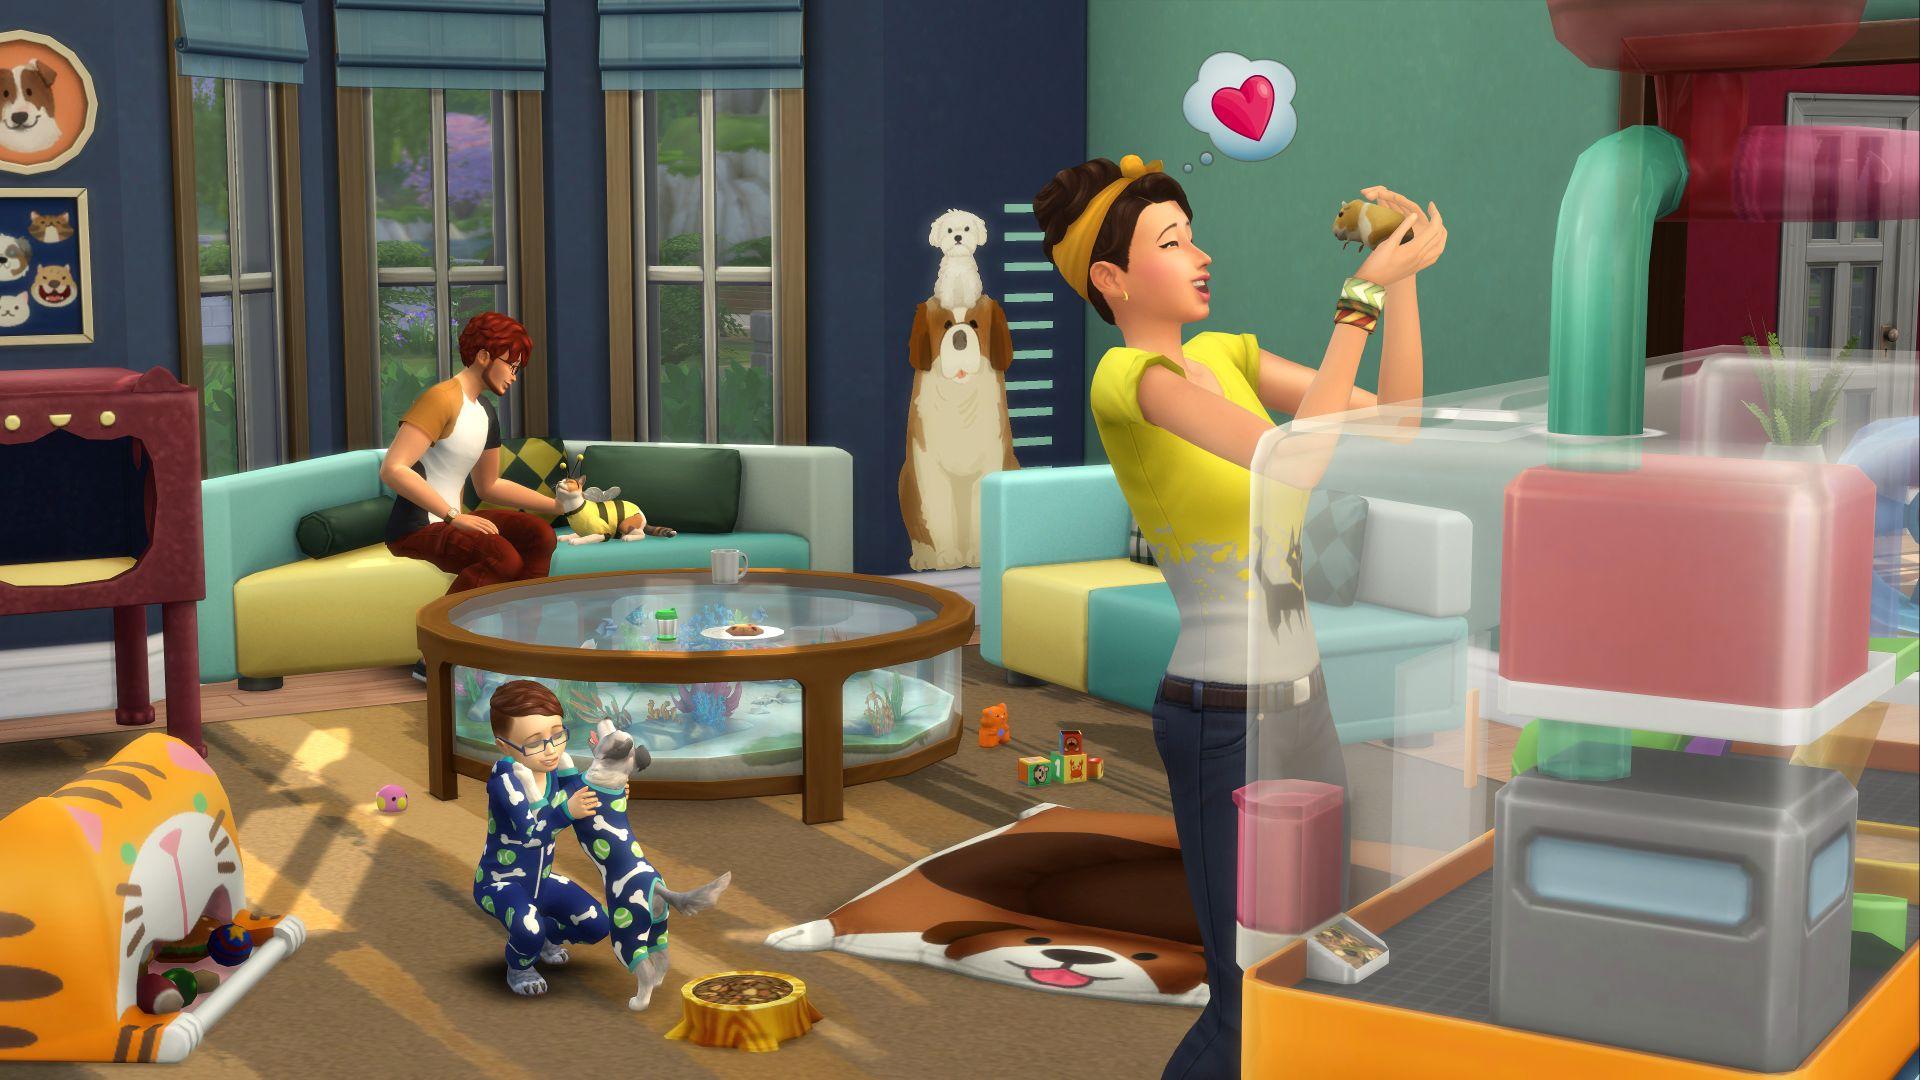 Die Sims 4 - Mein erstes Haustier / Tiny Houses / Waschtag / ... DLC - PC/Mac [Origin Access]